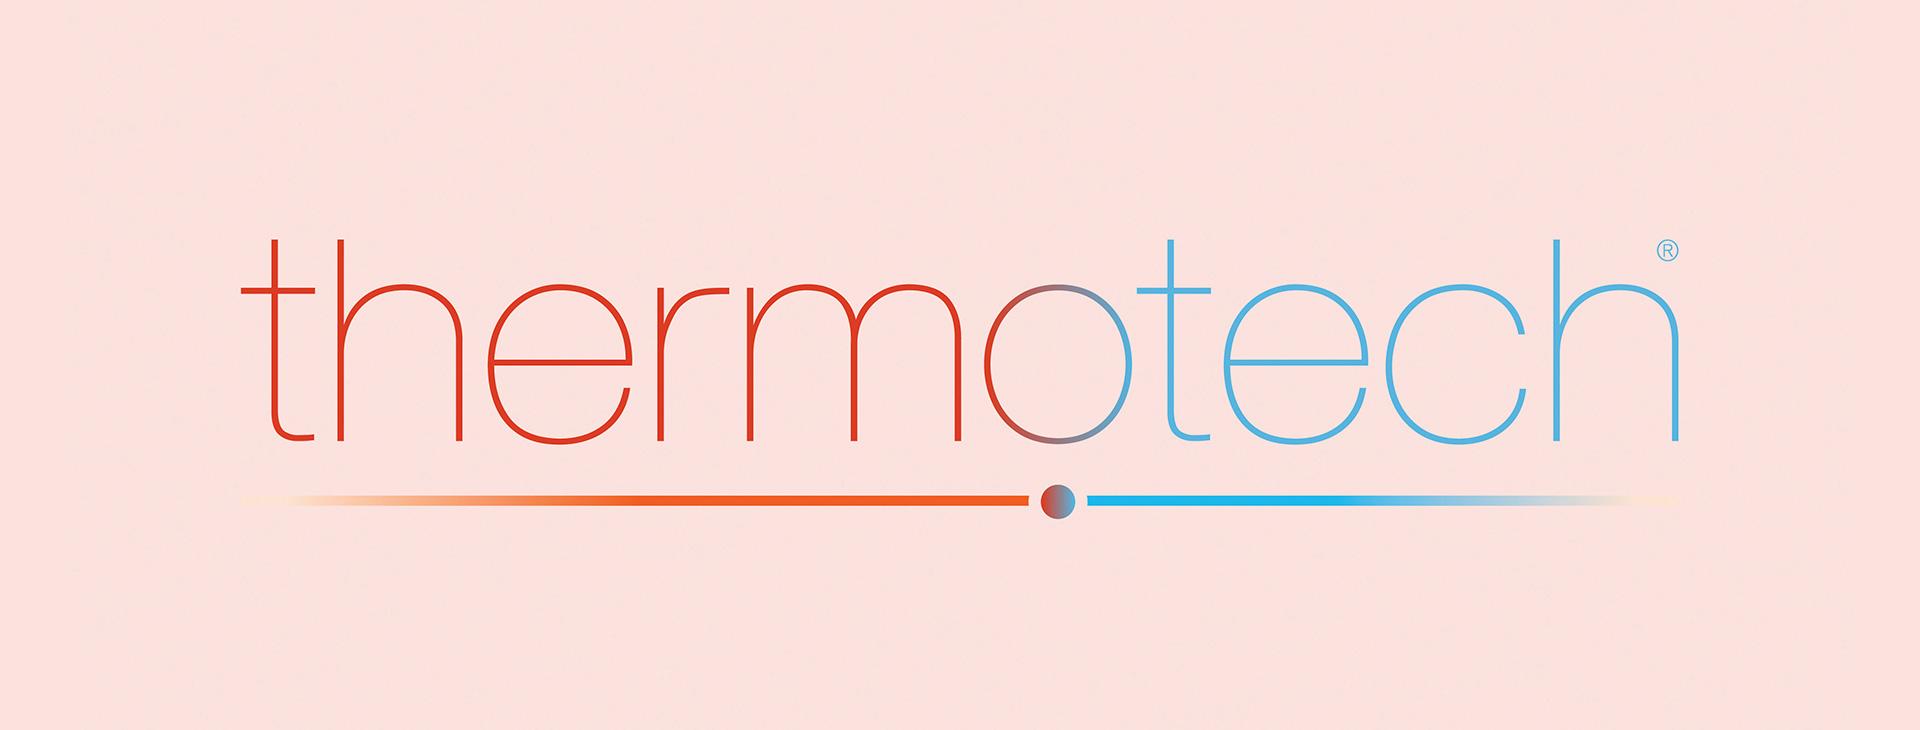 thermotech_lente_NO_20201102